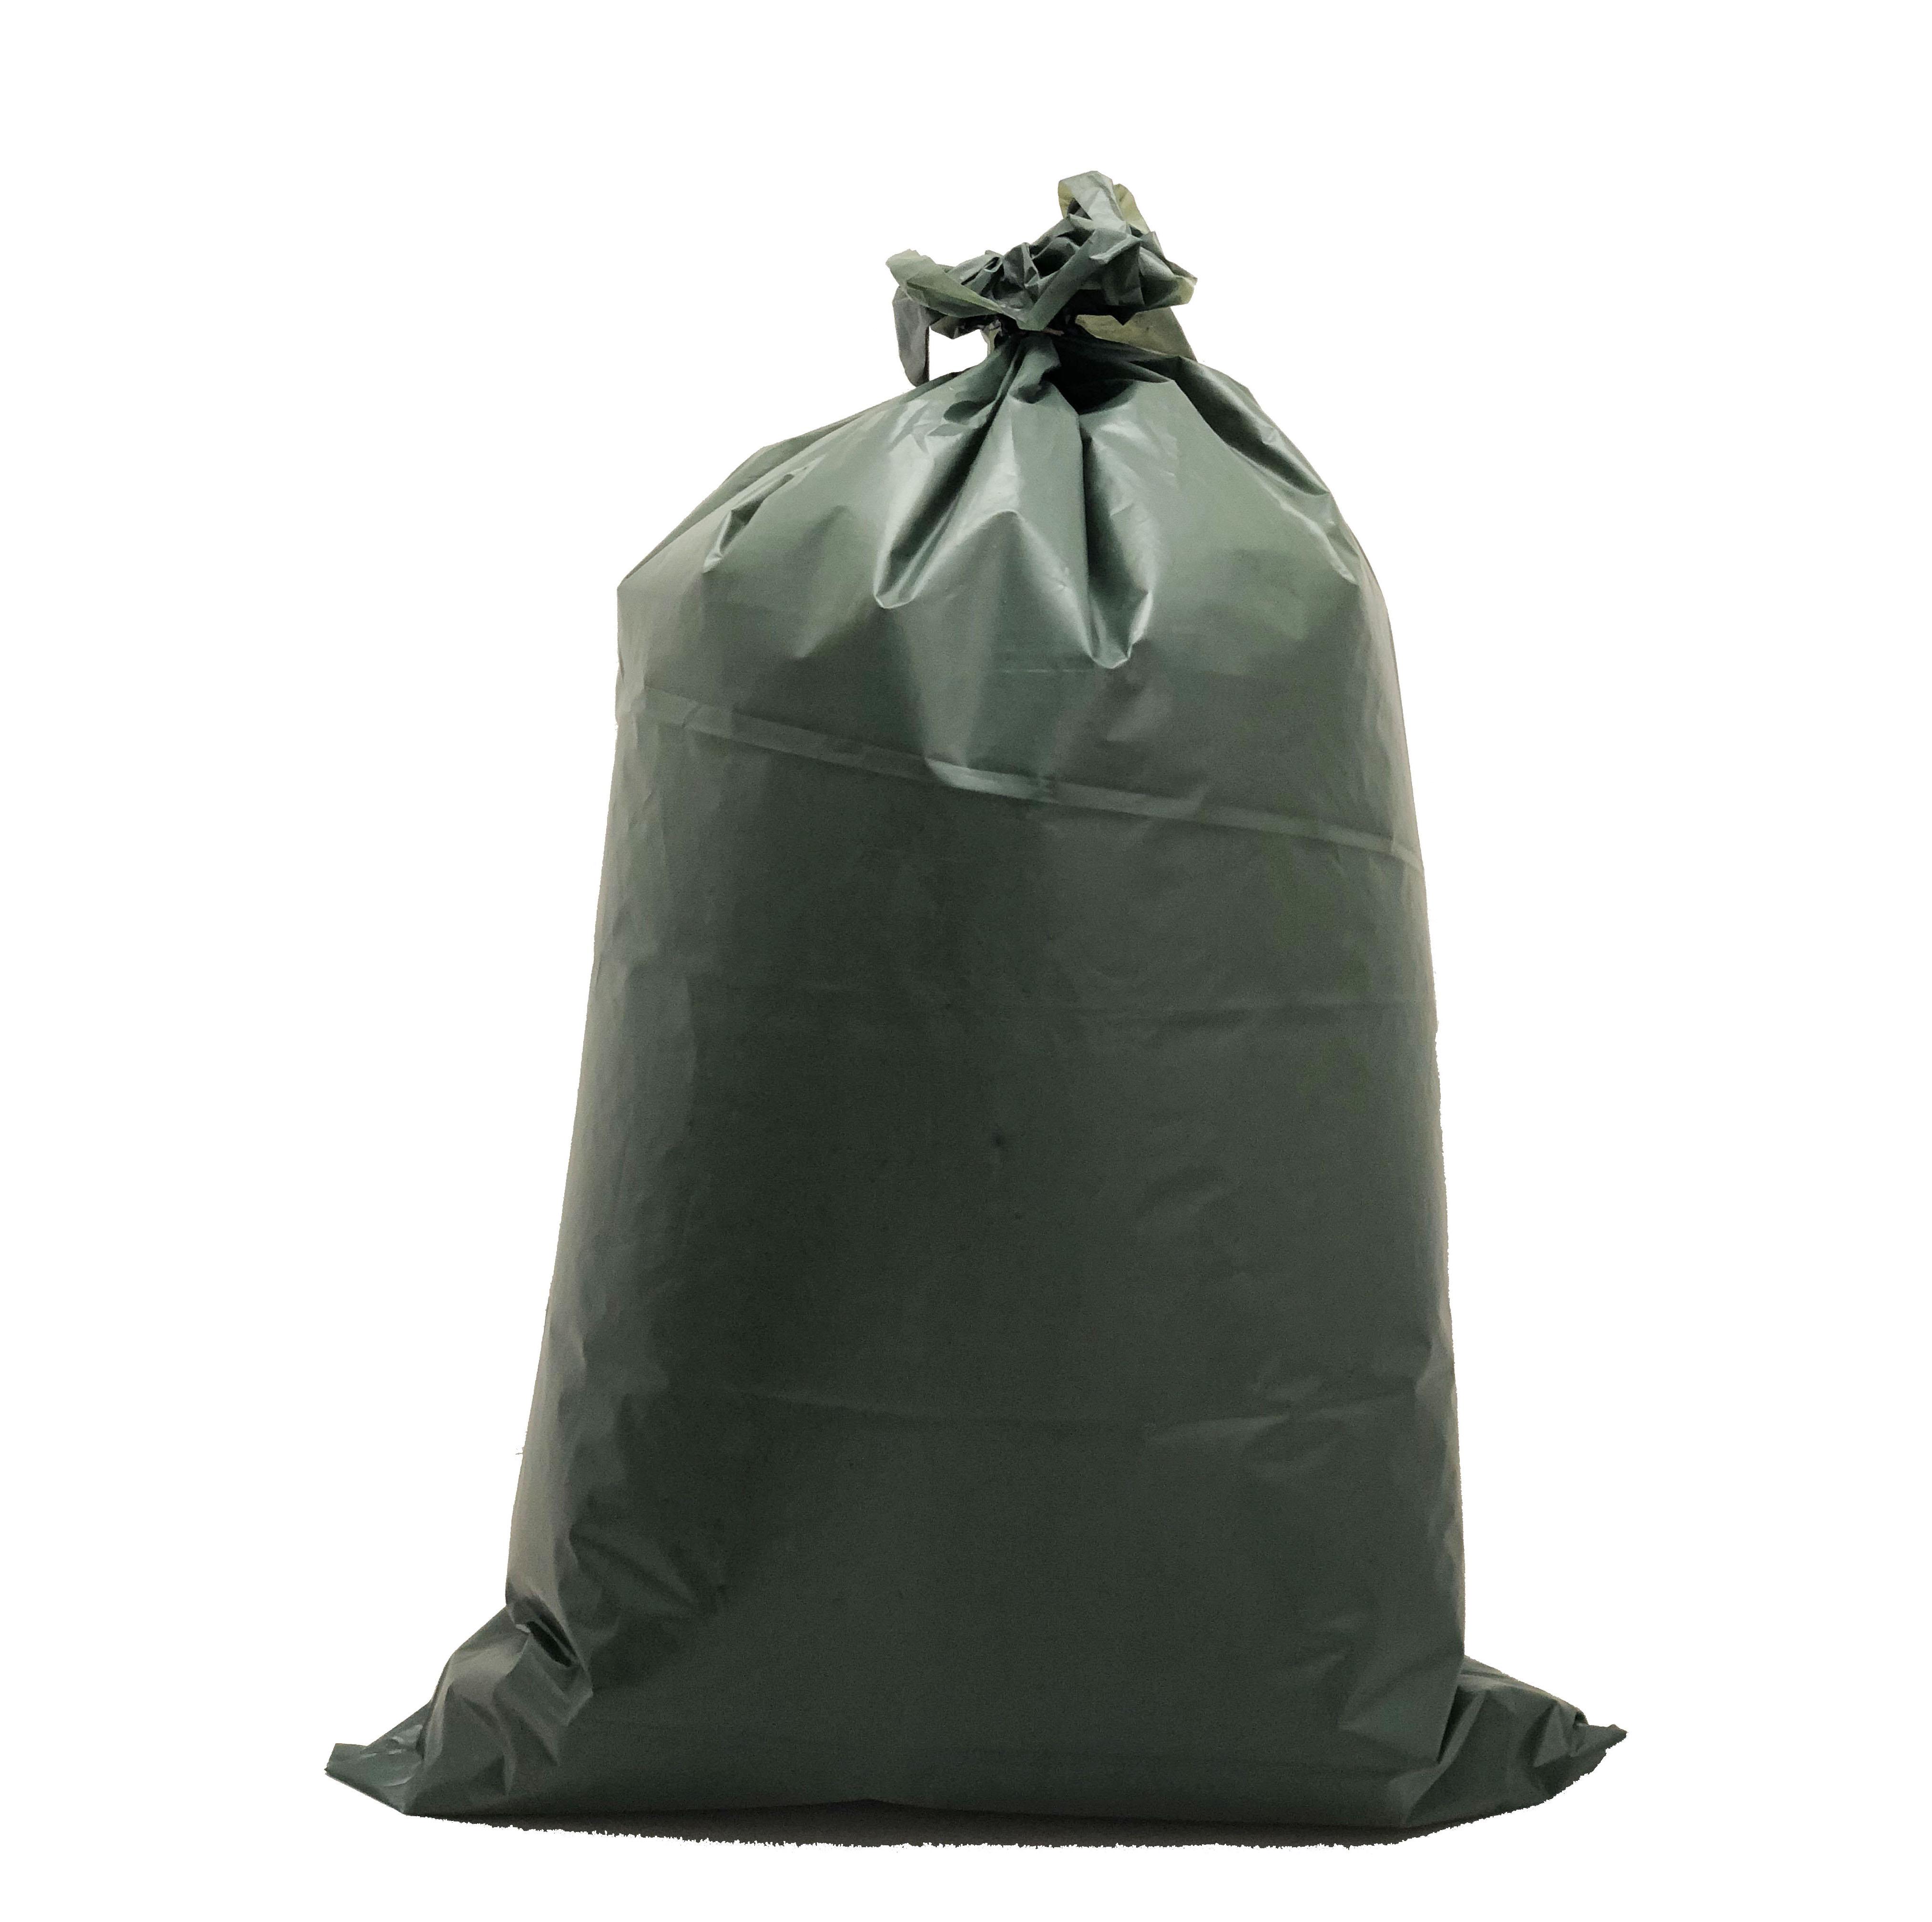 Plastik Sampah HIJAU / Trash Bag TEBAL BERKUALITAS 70-90micron